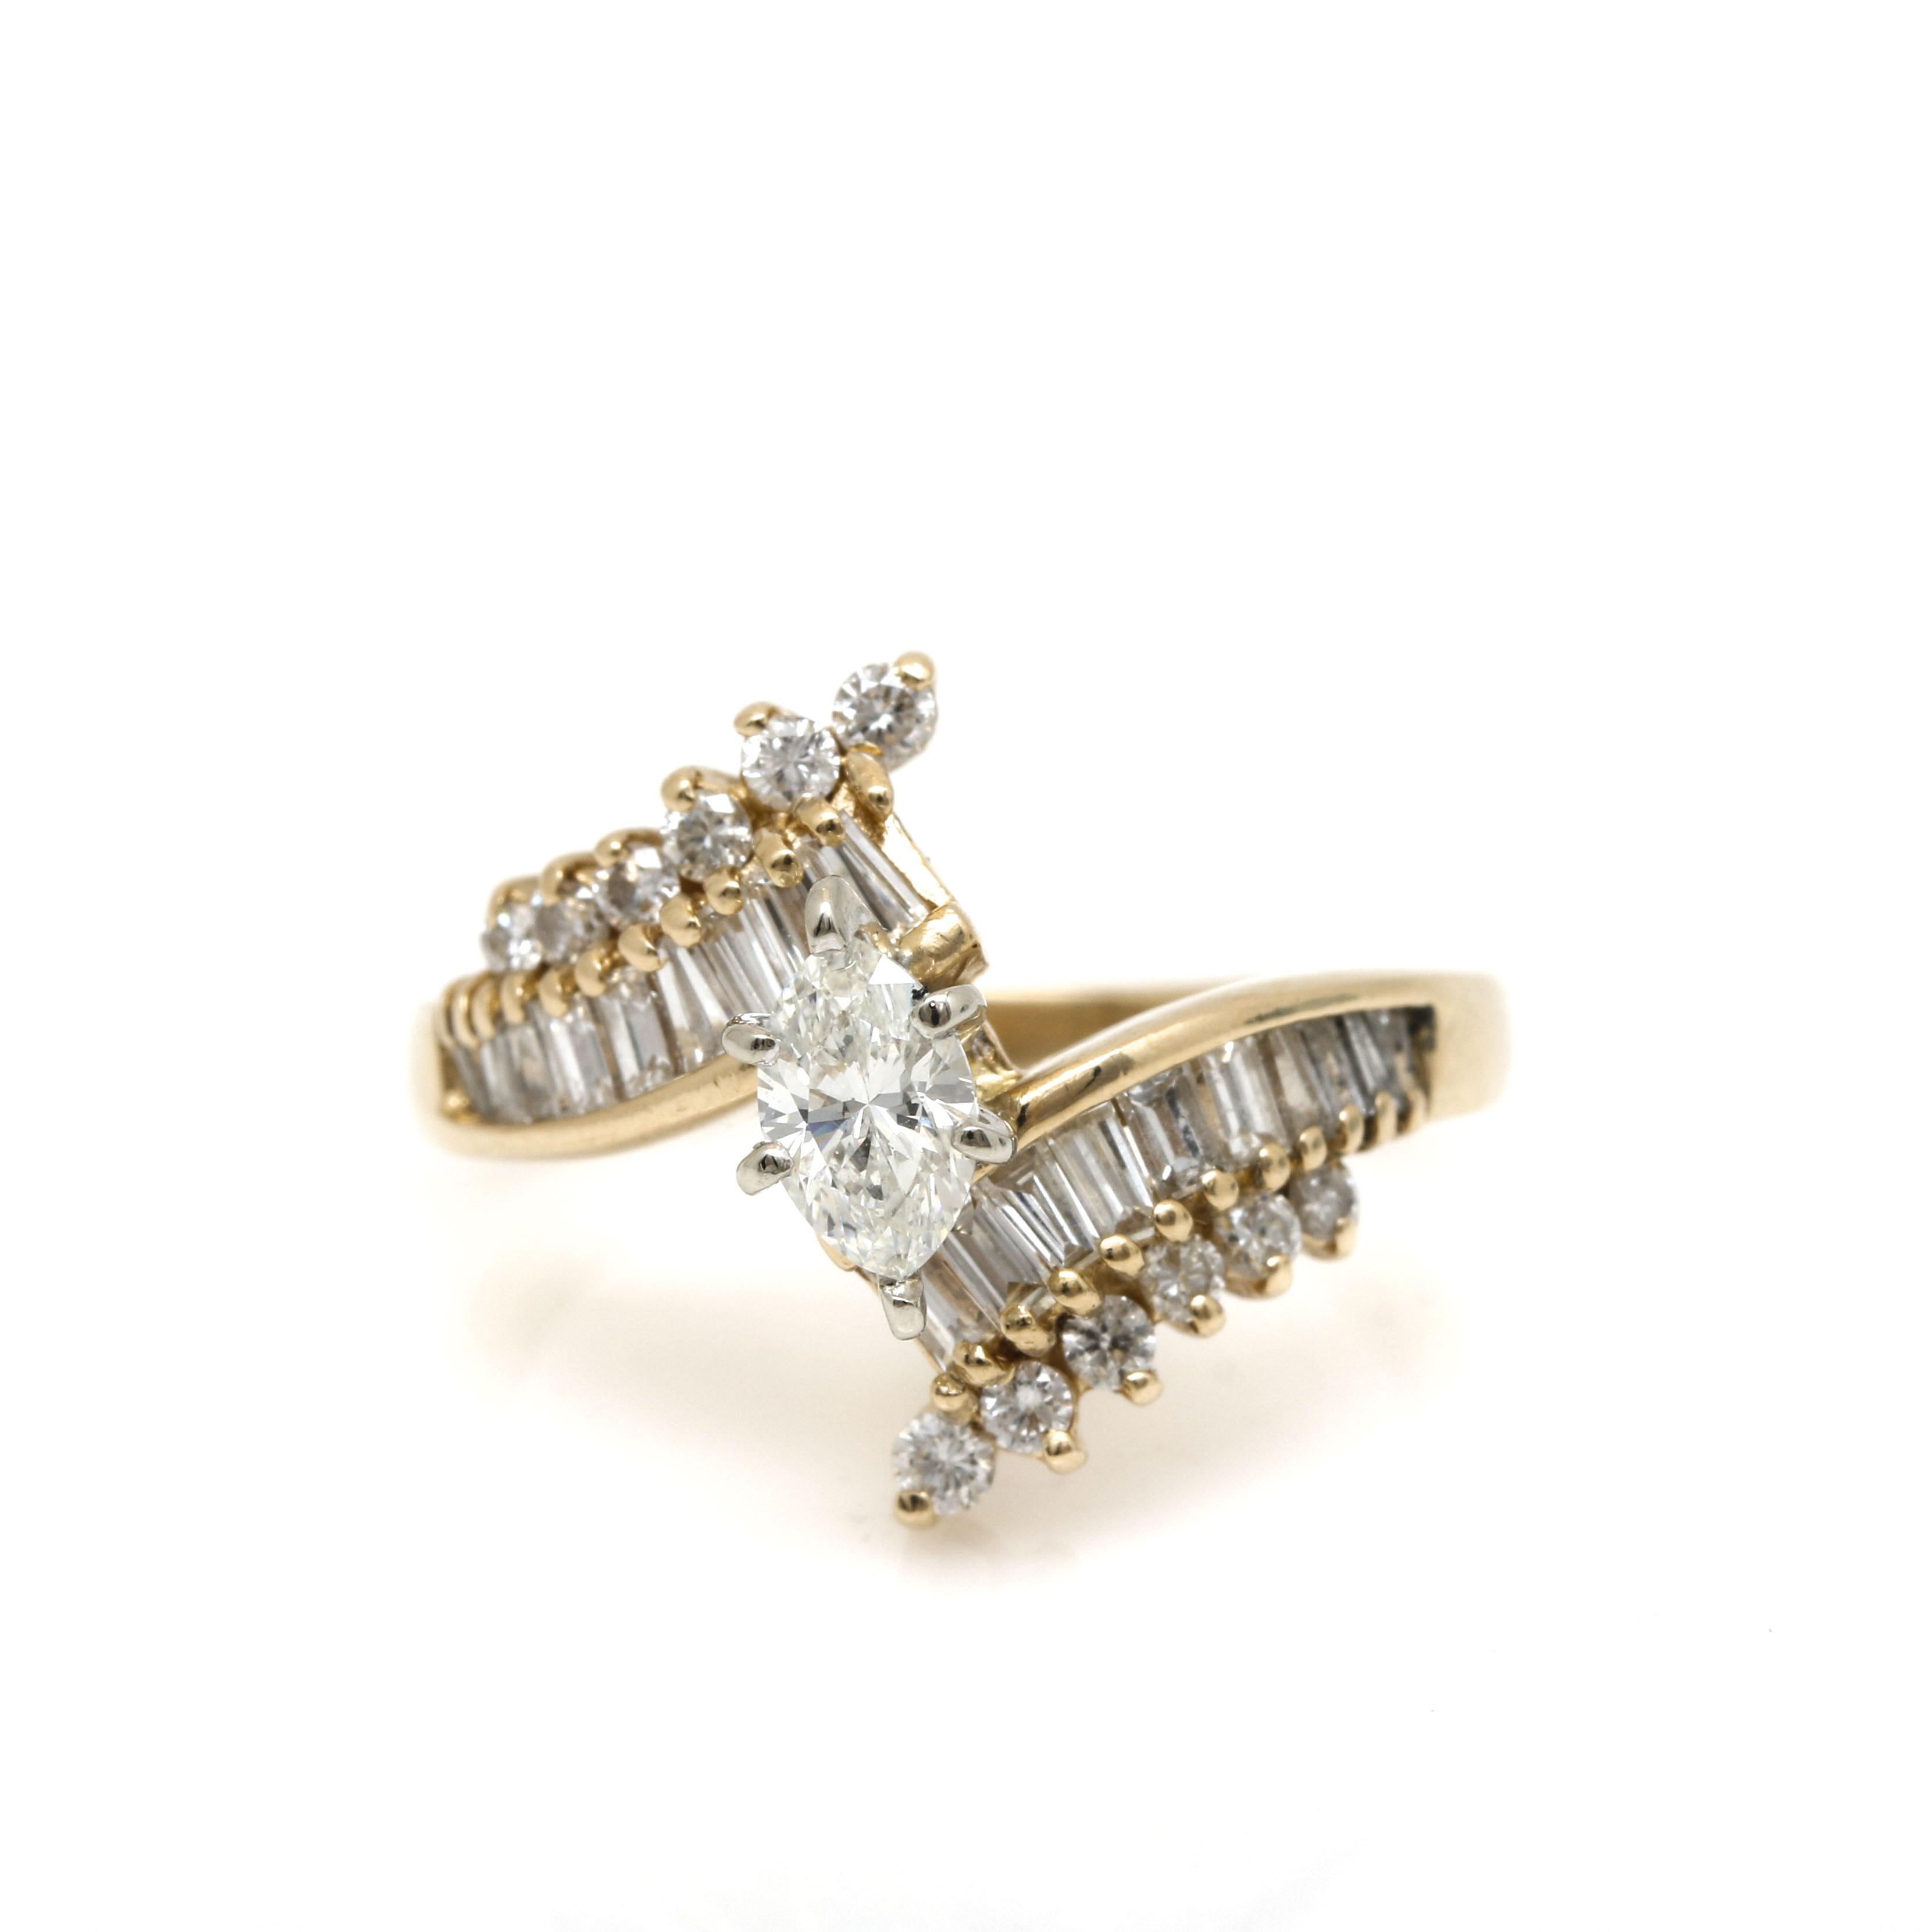 14K Yellow Gold 1.14 CTW Diamond Bypass Ring